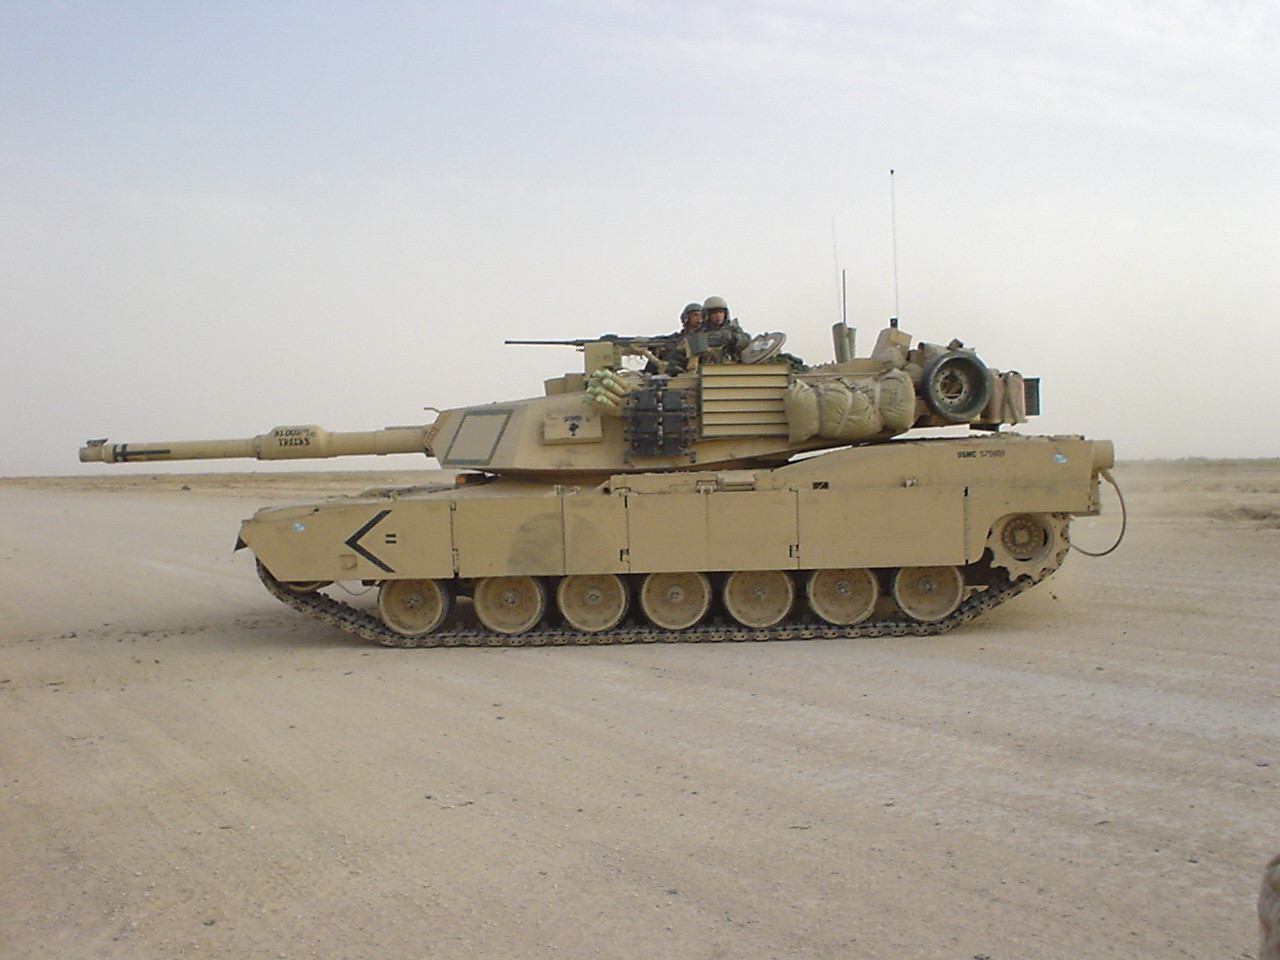 M1A1主力戰車 - 軍事貼圖區 - 公仔箱論壇 - Powered by Discuz!